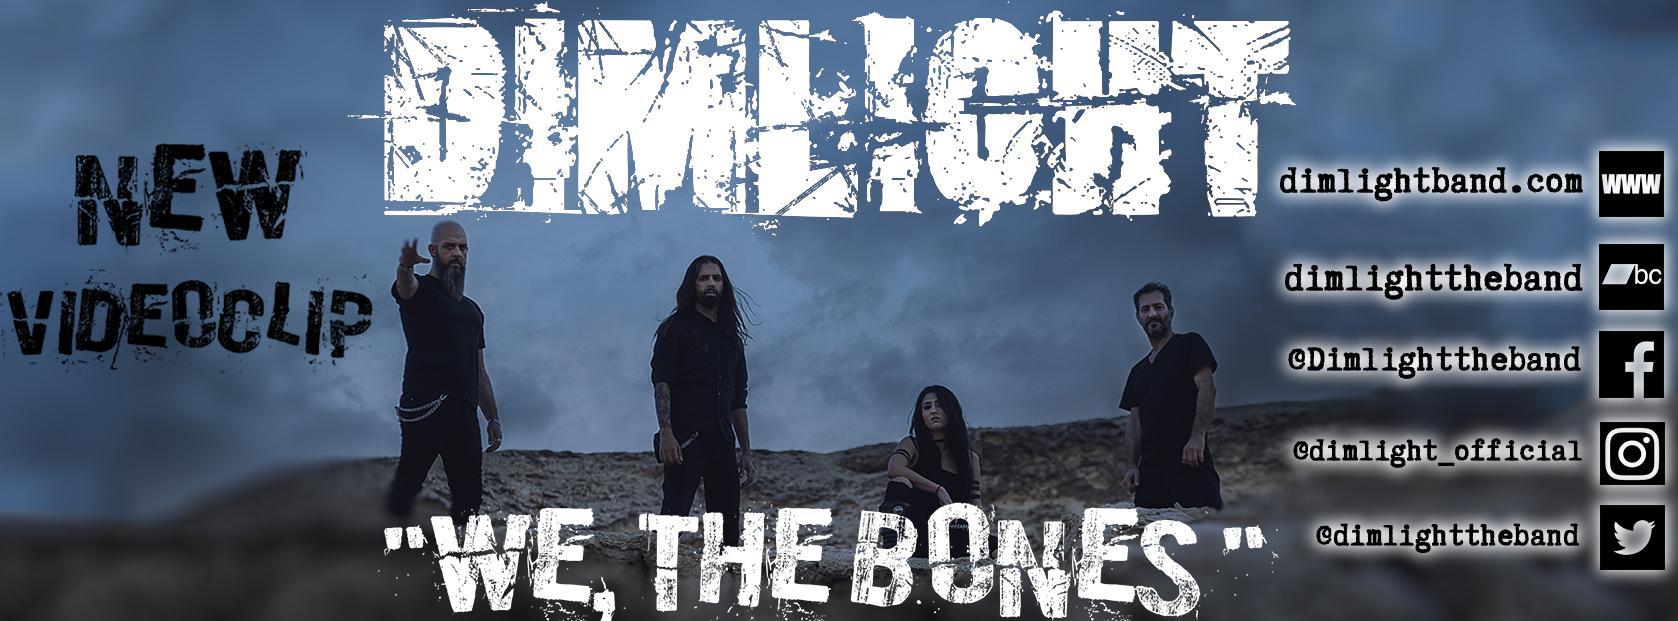 "DIMLIGHT: Νέο επίσημο μουσικό βίντεο για το τραγούδι ""We, The Bones"""